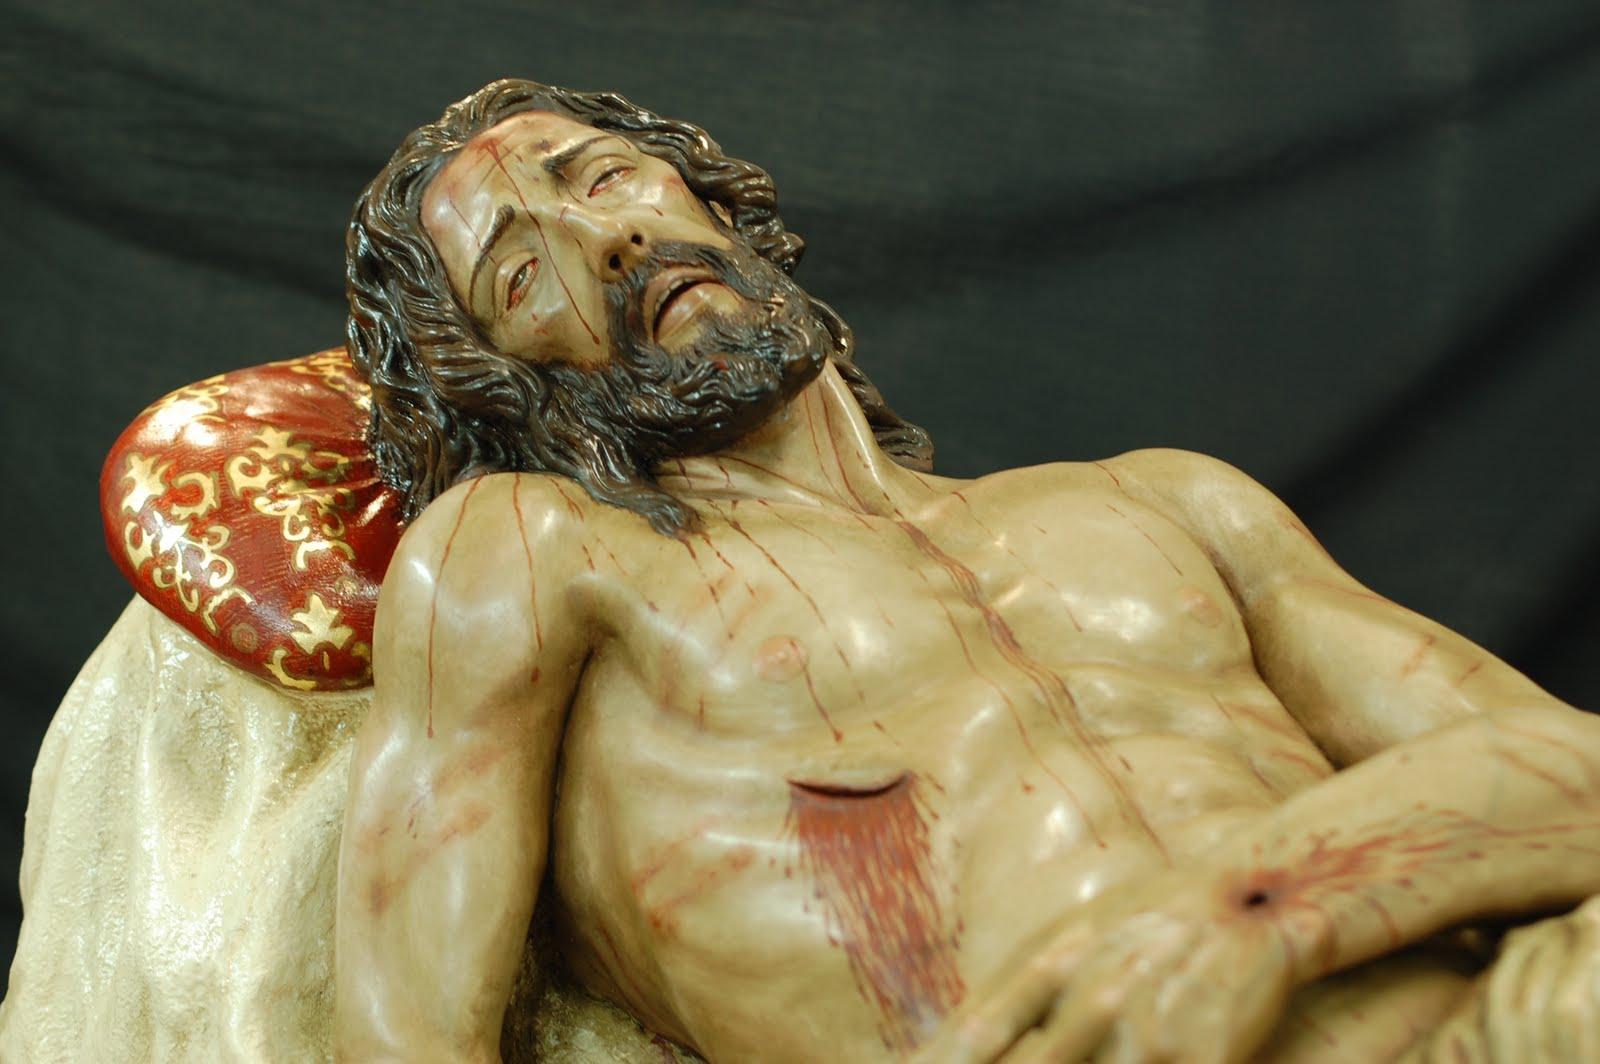 http://4.bp.blogspot.com/-RCZtFo0KZbA/TaCy0wcIAcI/AAAAAAAAAig/dIGXjiQnY7o/s1600/Cristo+Yacente+-+Daniel+del+Valle.JPG